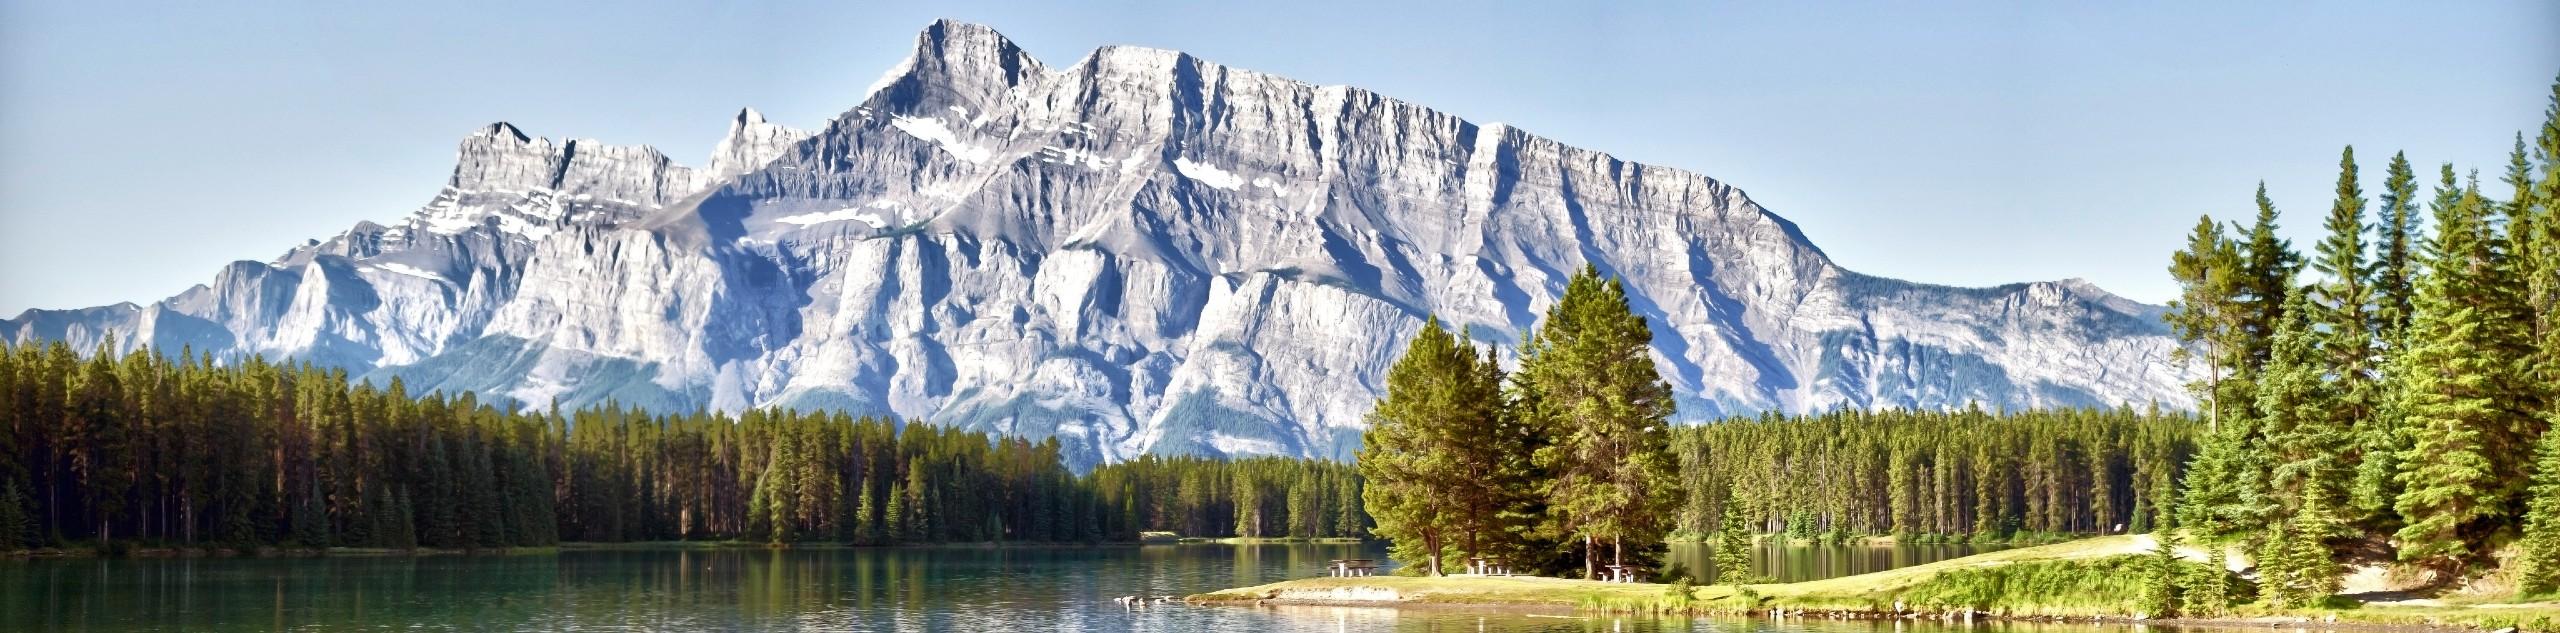 Banff and Yoho Hiking Tour